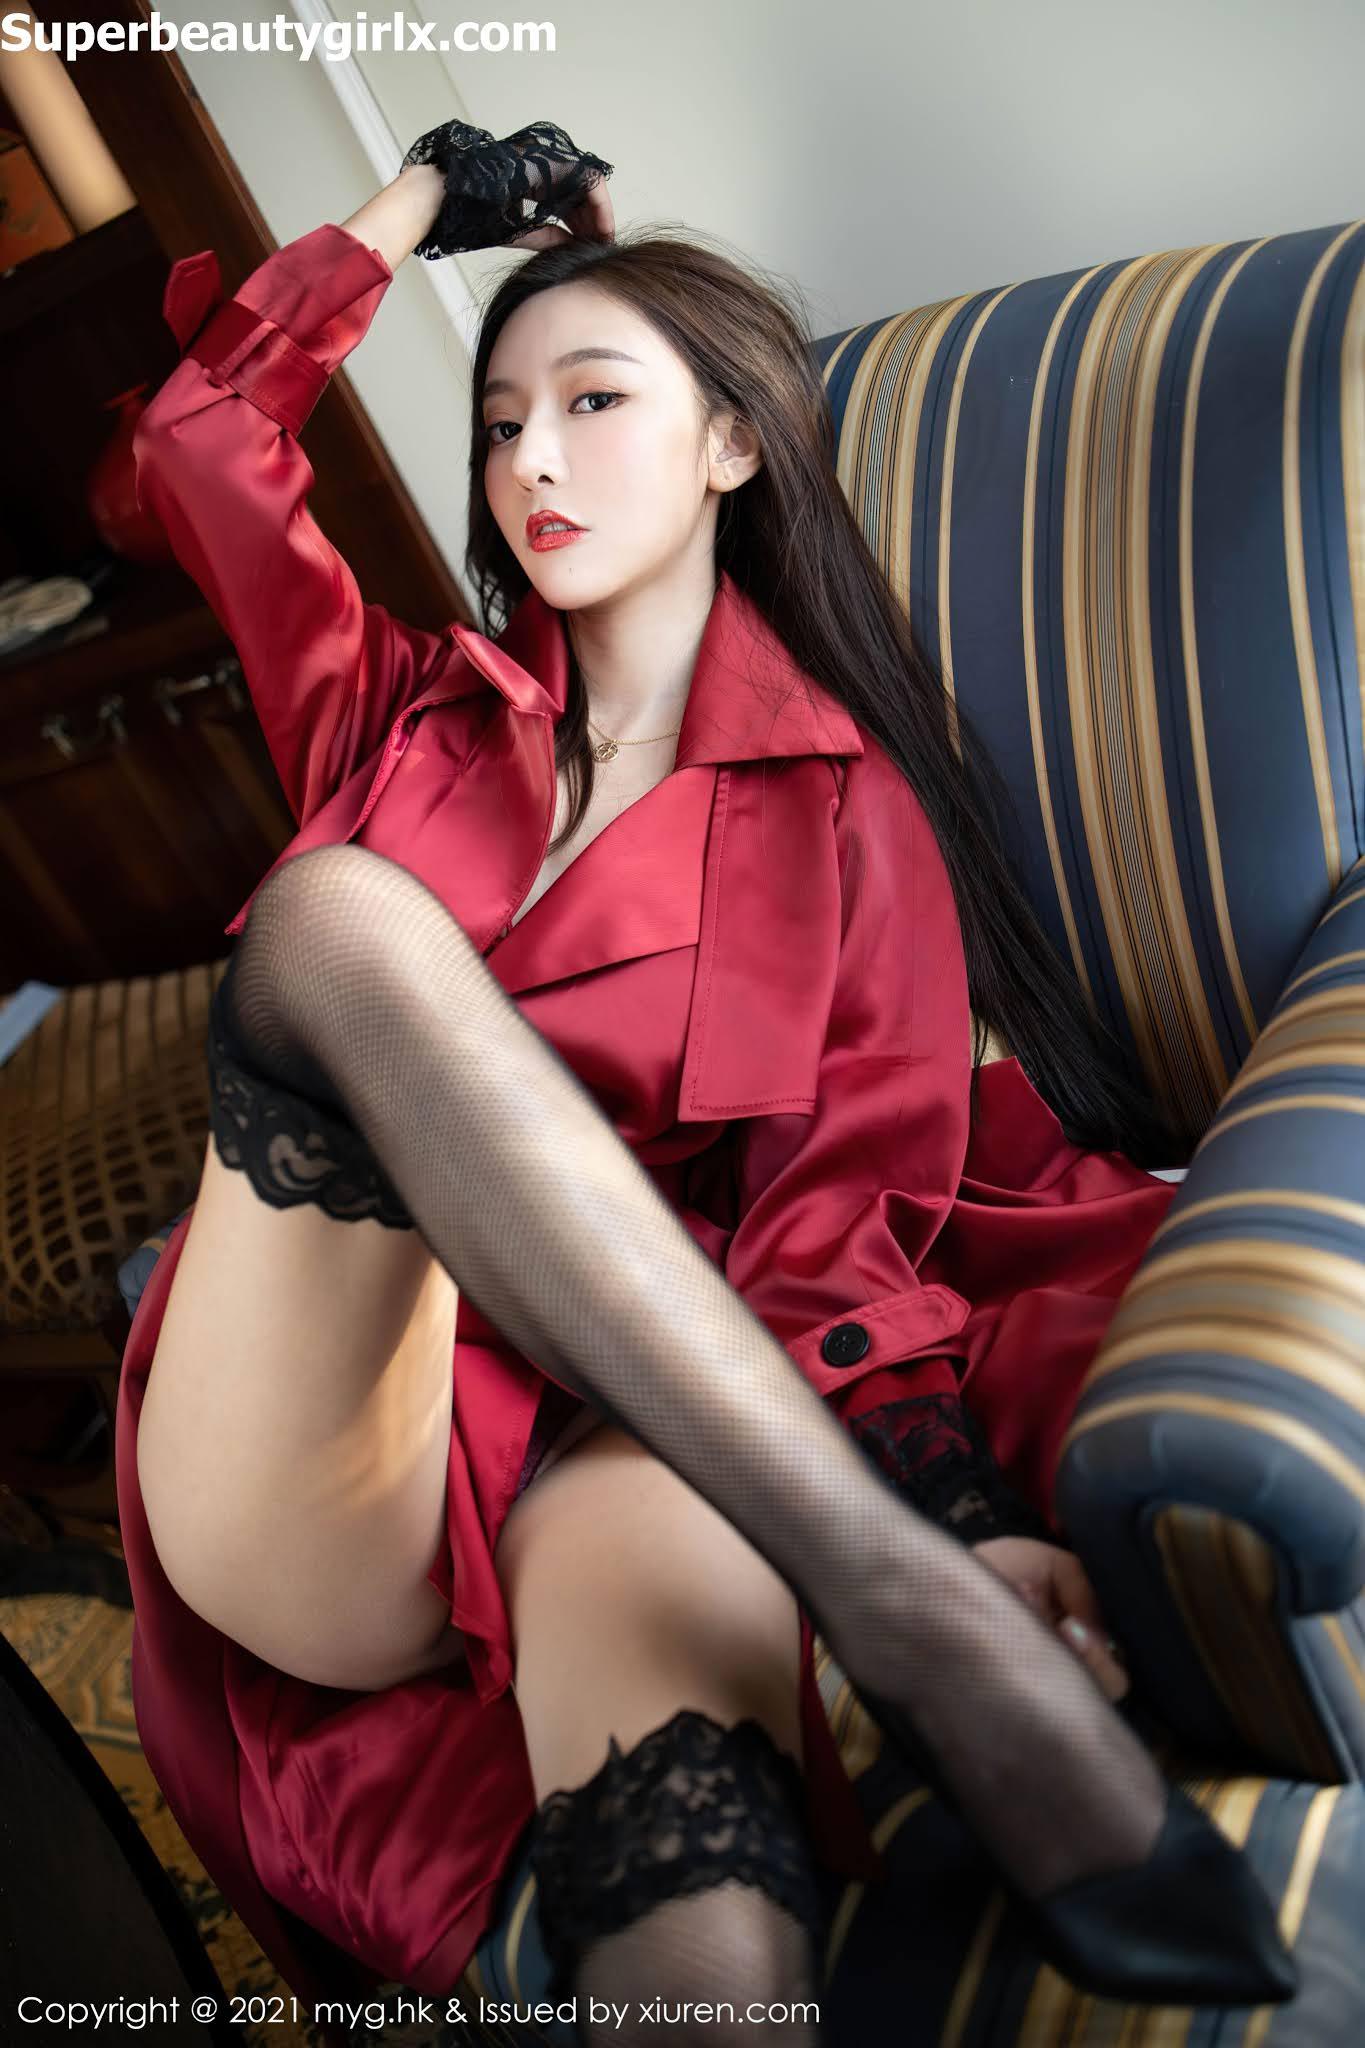 MyGirl-Vol.496-Yanni-Wang-Xin-Yao-Superbeautygirlx.com